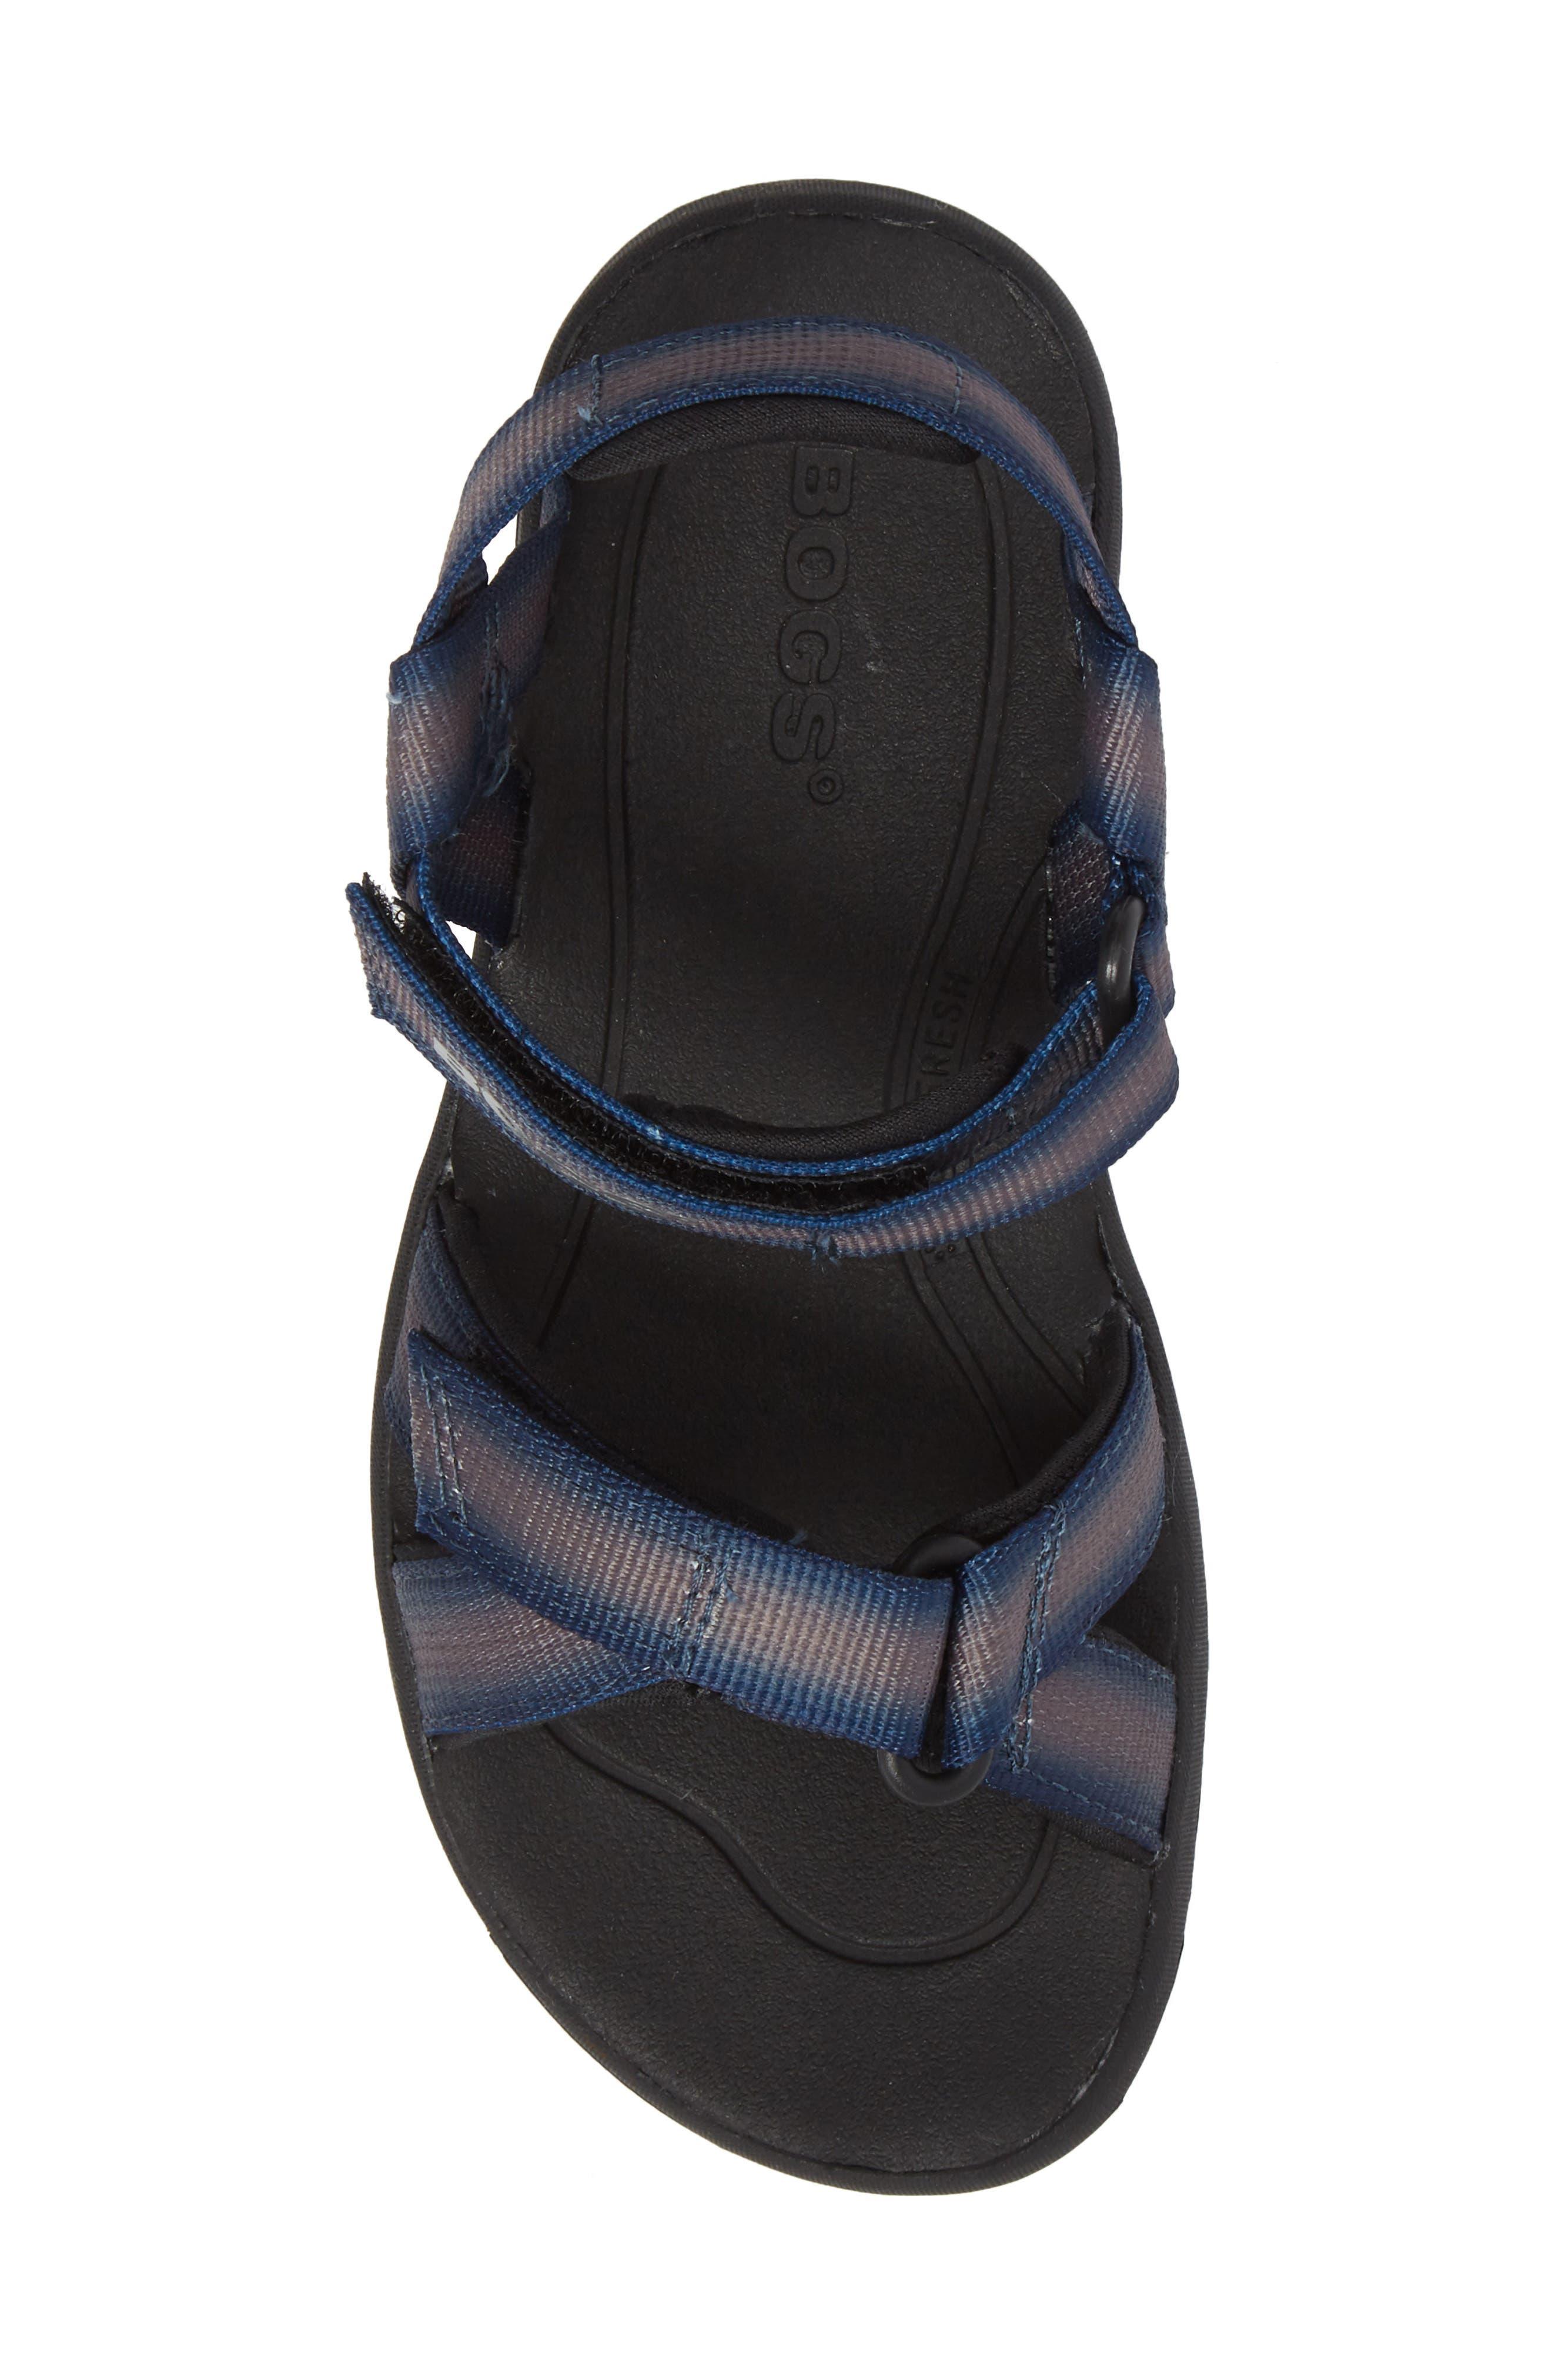 BOGS, Rio Sunrise Stripe Sandal, Alternate thumbnail 5, color, 062